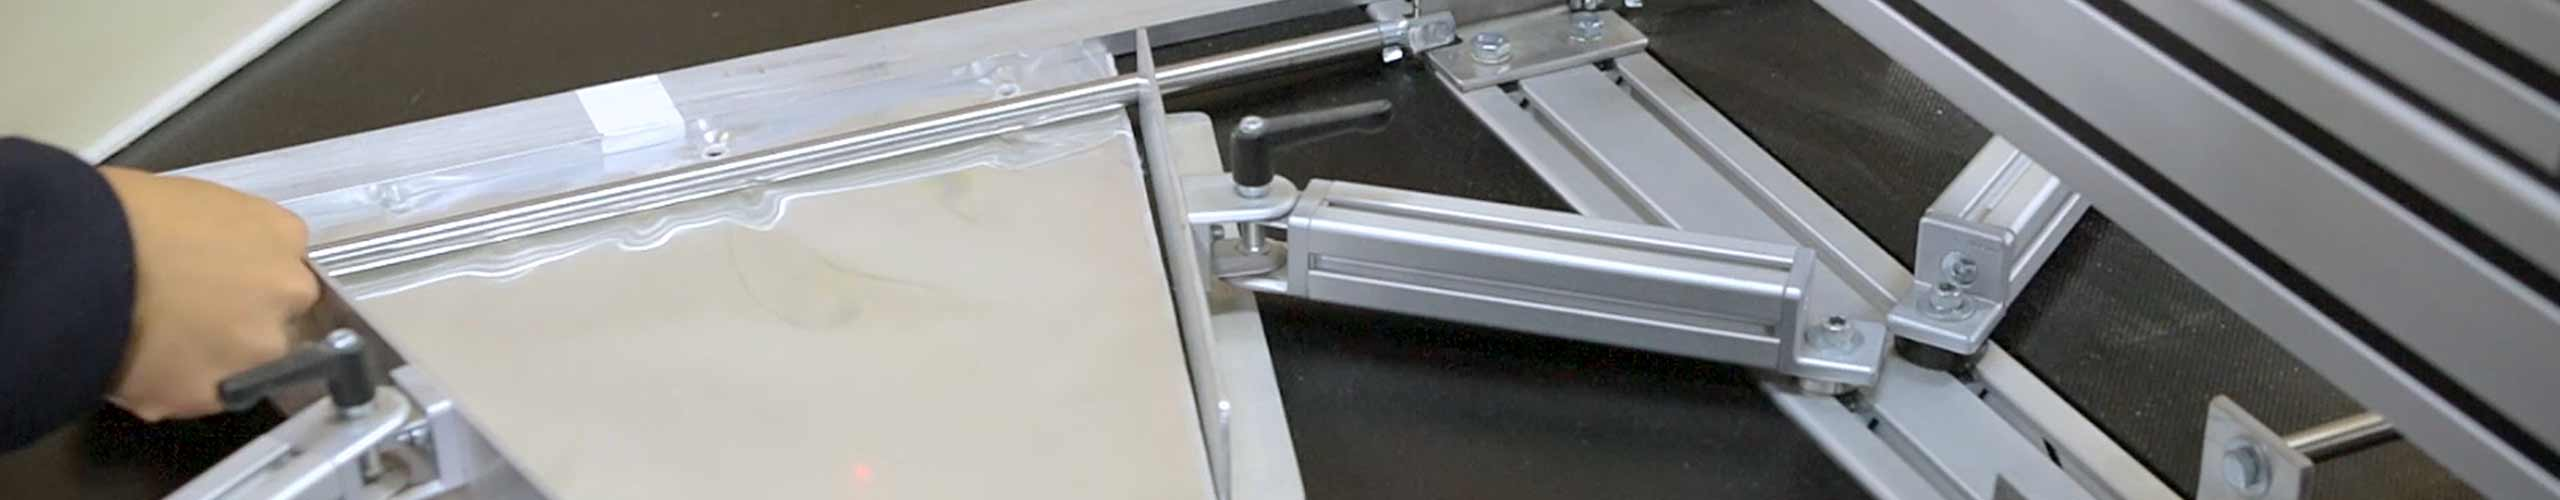 Robotag Labeling Machine met vullade